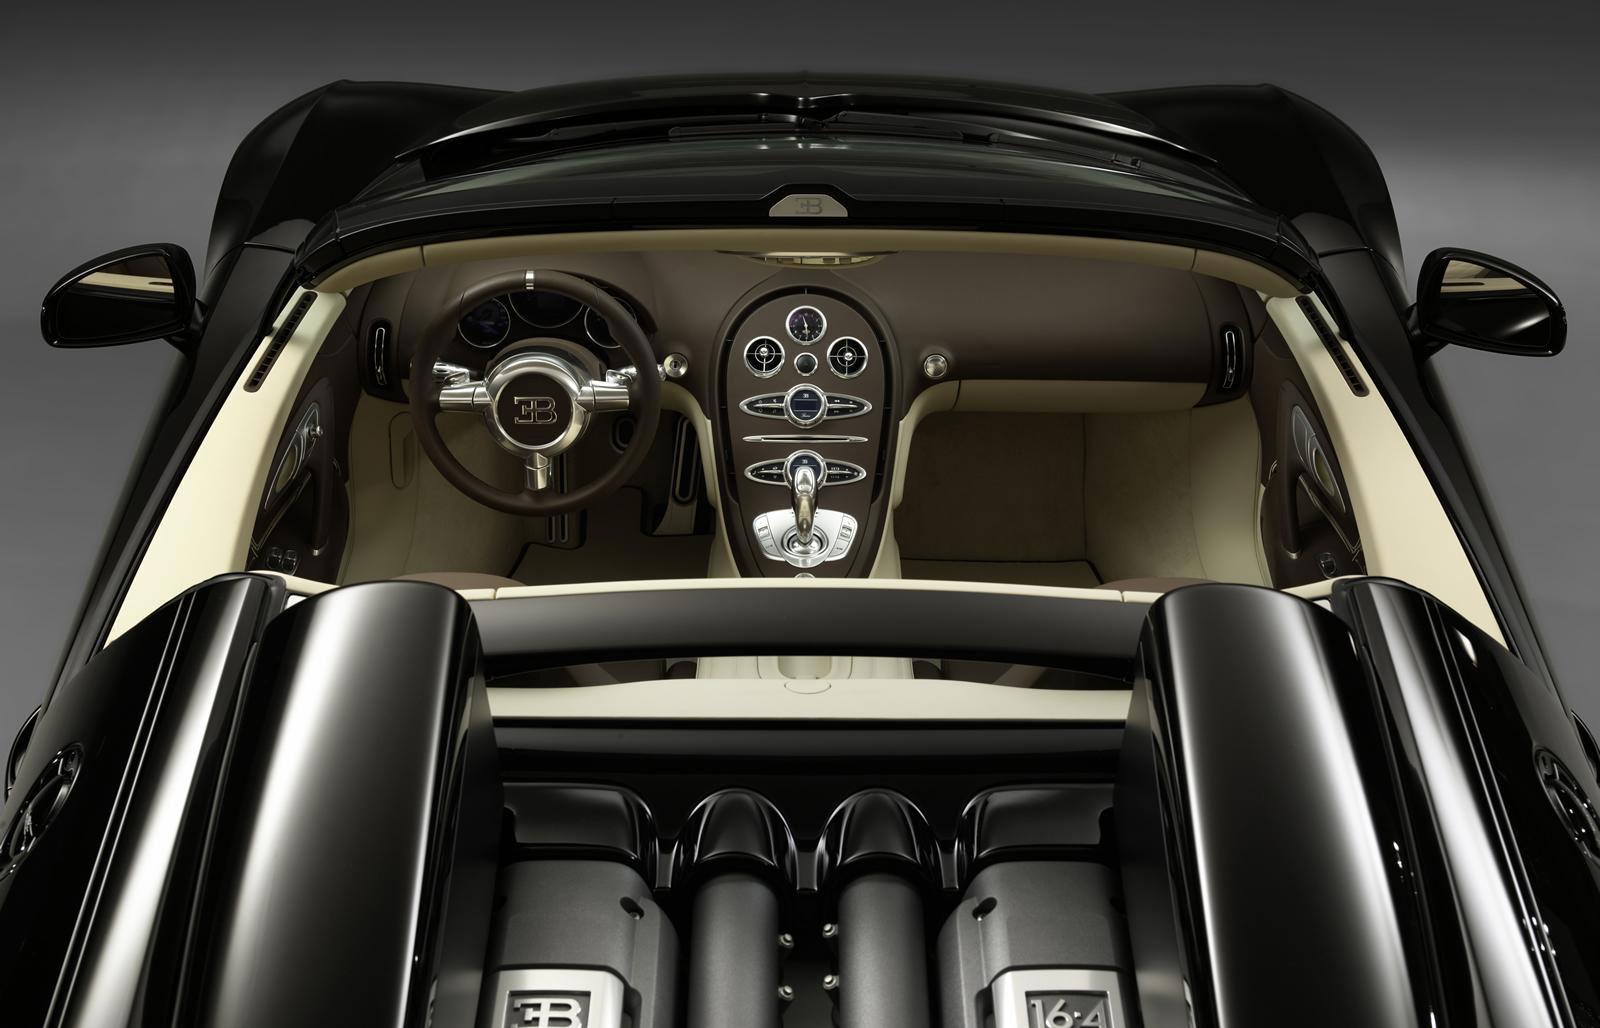 Bugatti-Veyron-Grand-Sport-Vitesse-Legend-Jean-Bugatti-edition-9